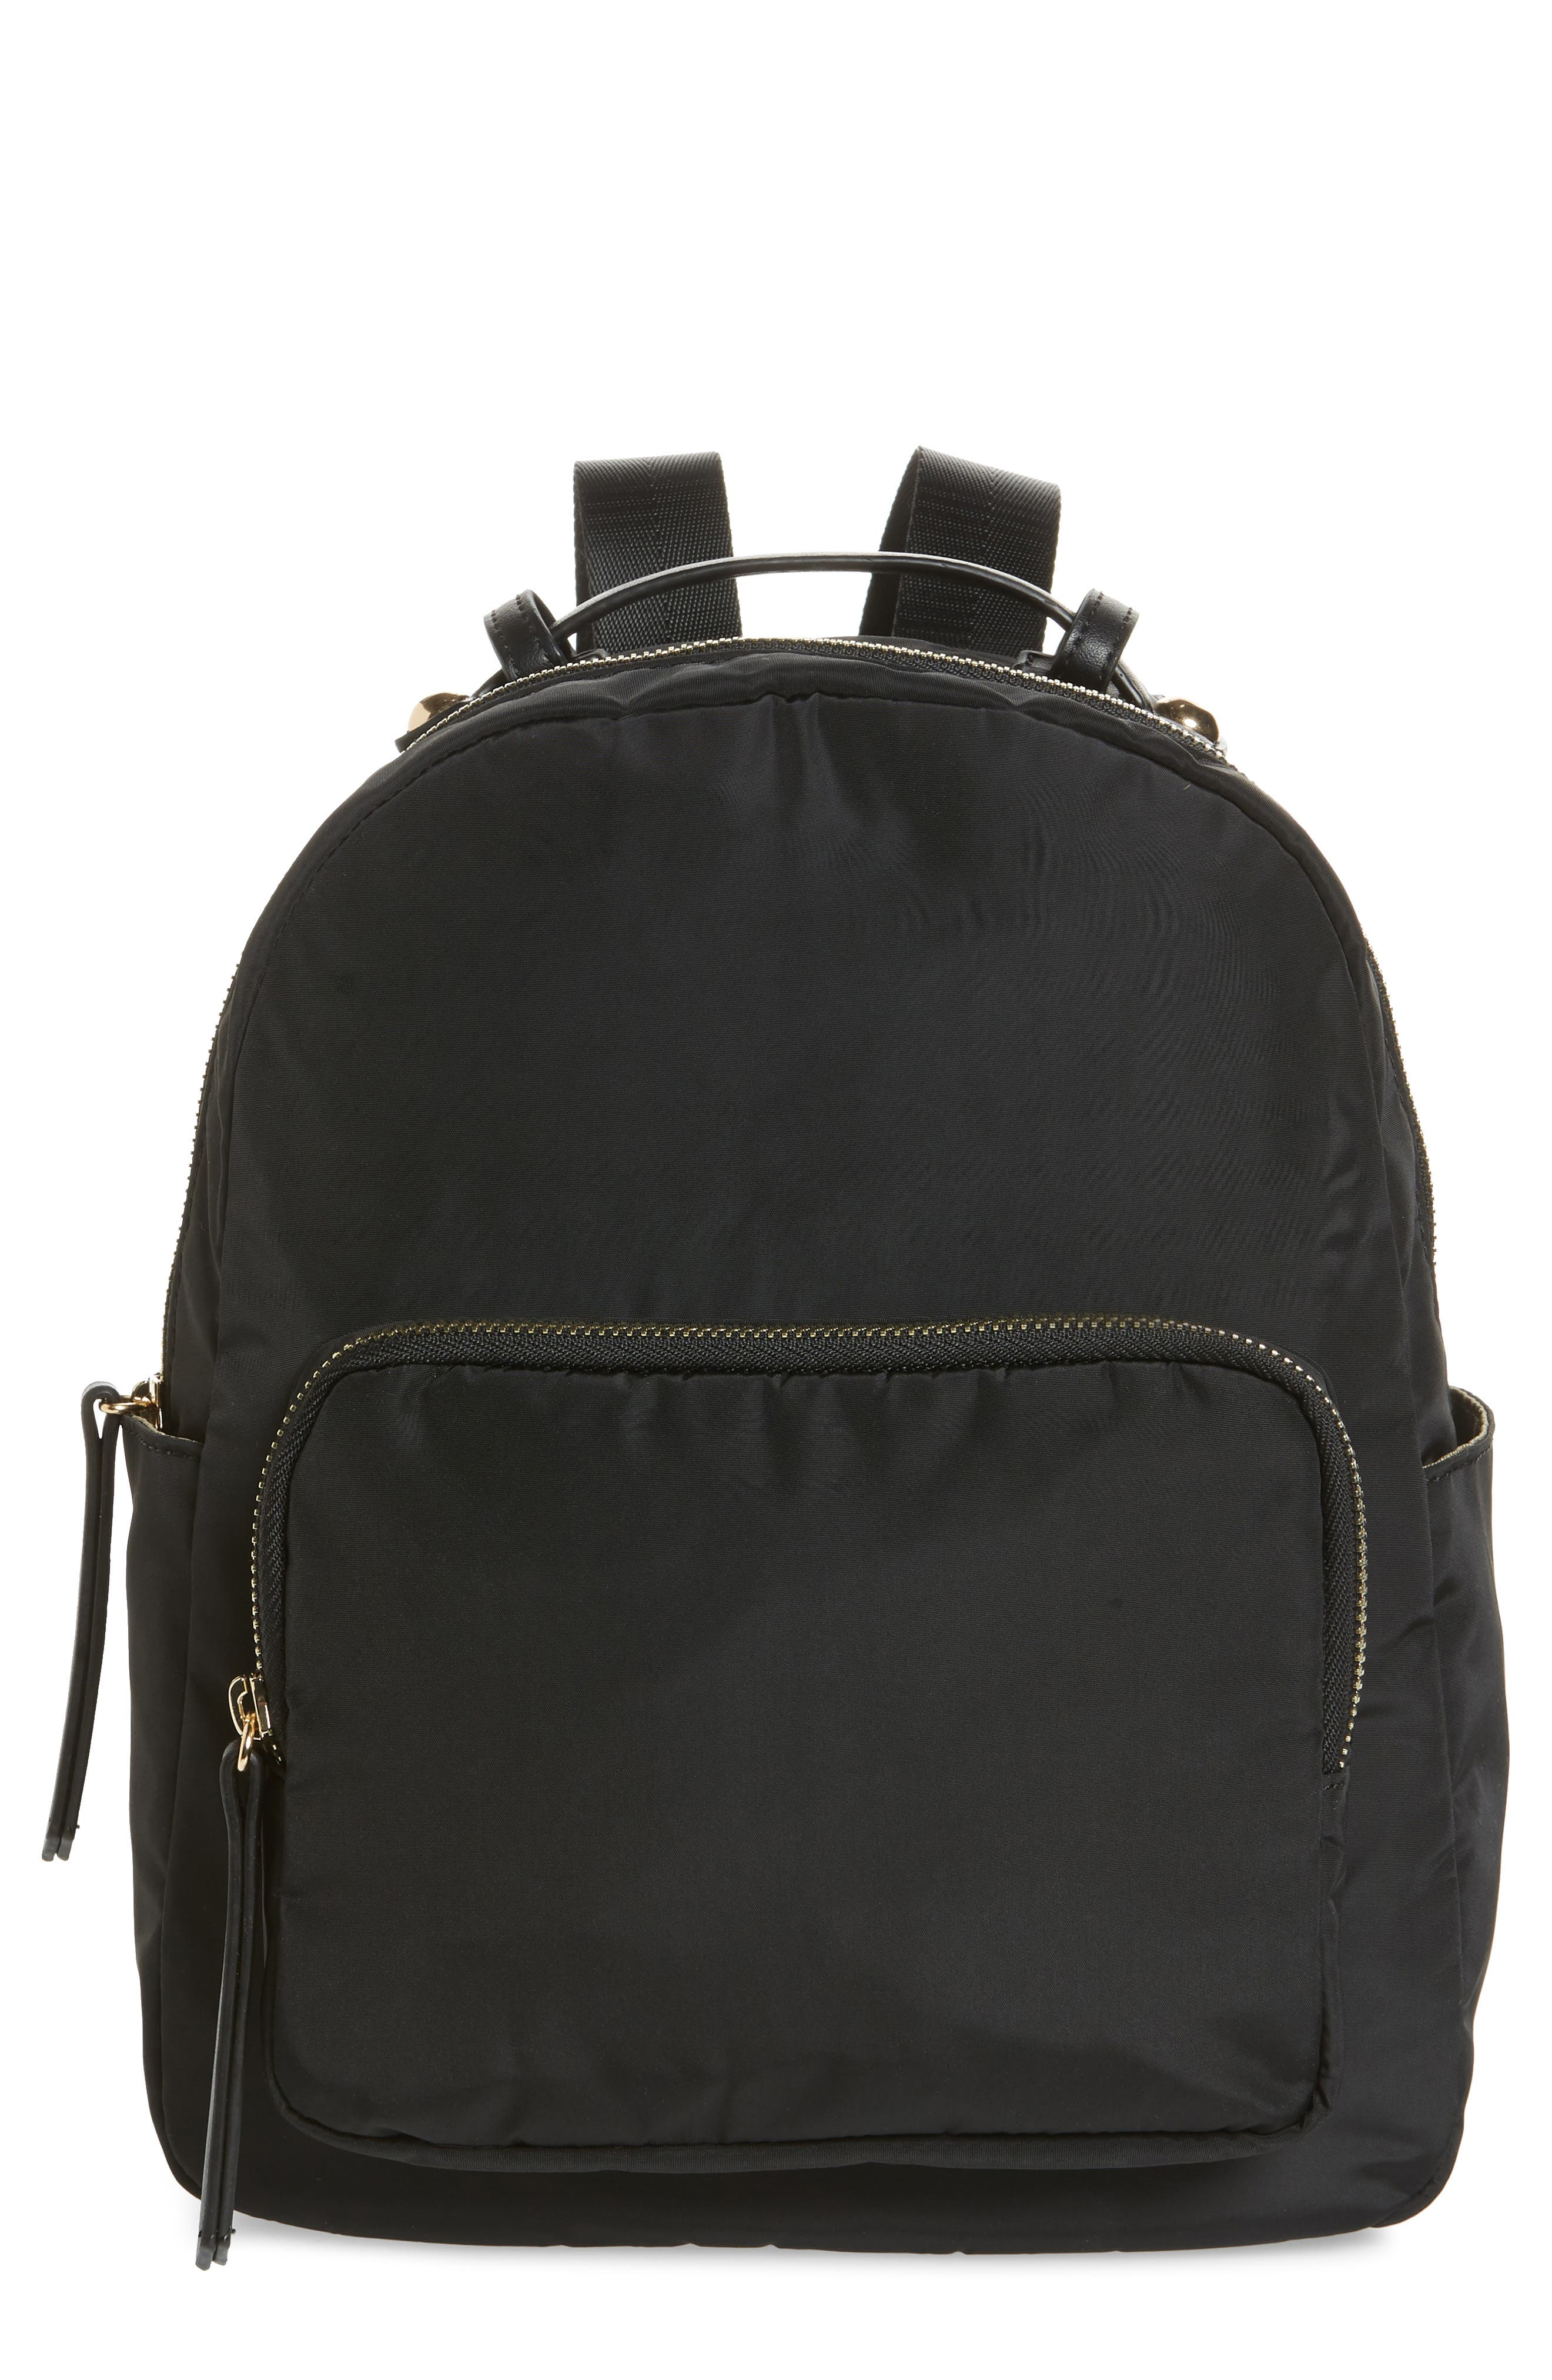 SONDRA ROBERTS,                             Nylon Backpack,                             Main thumbnail 1, color,                             001